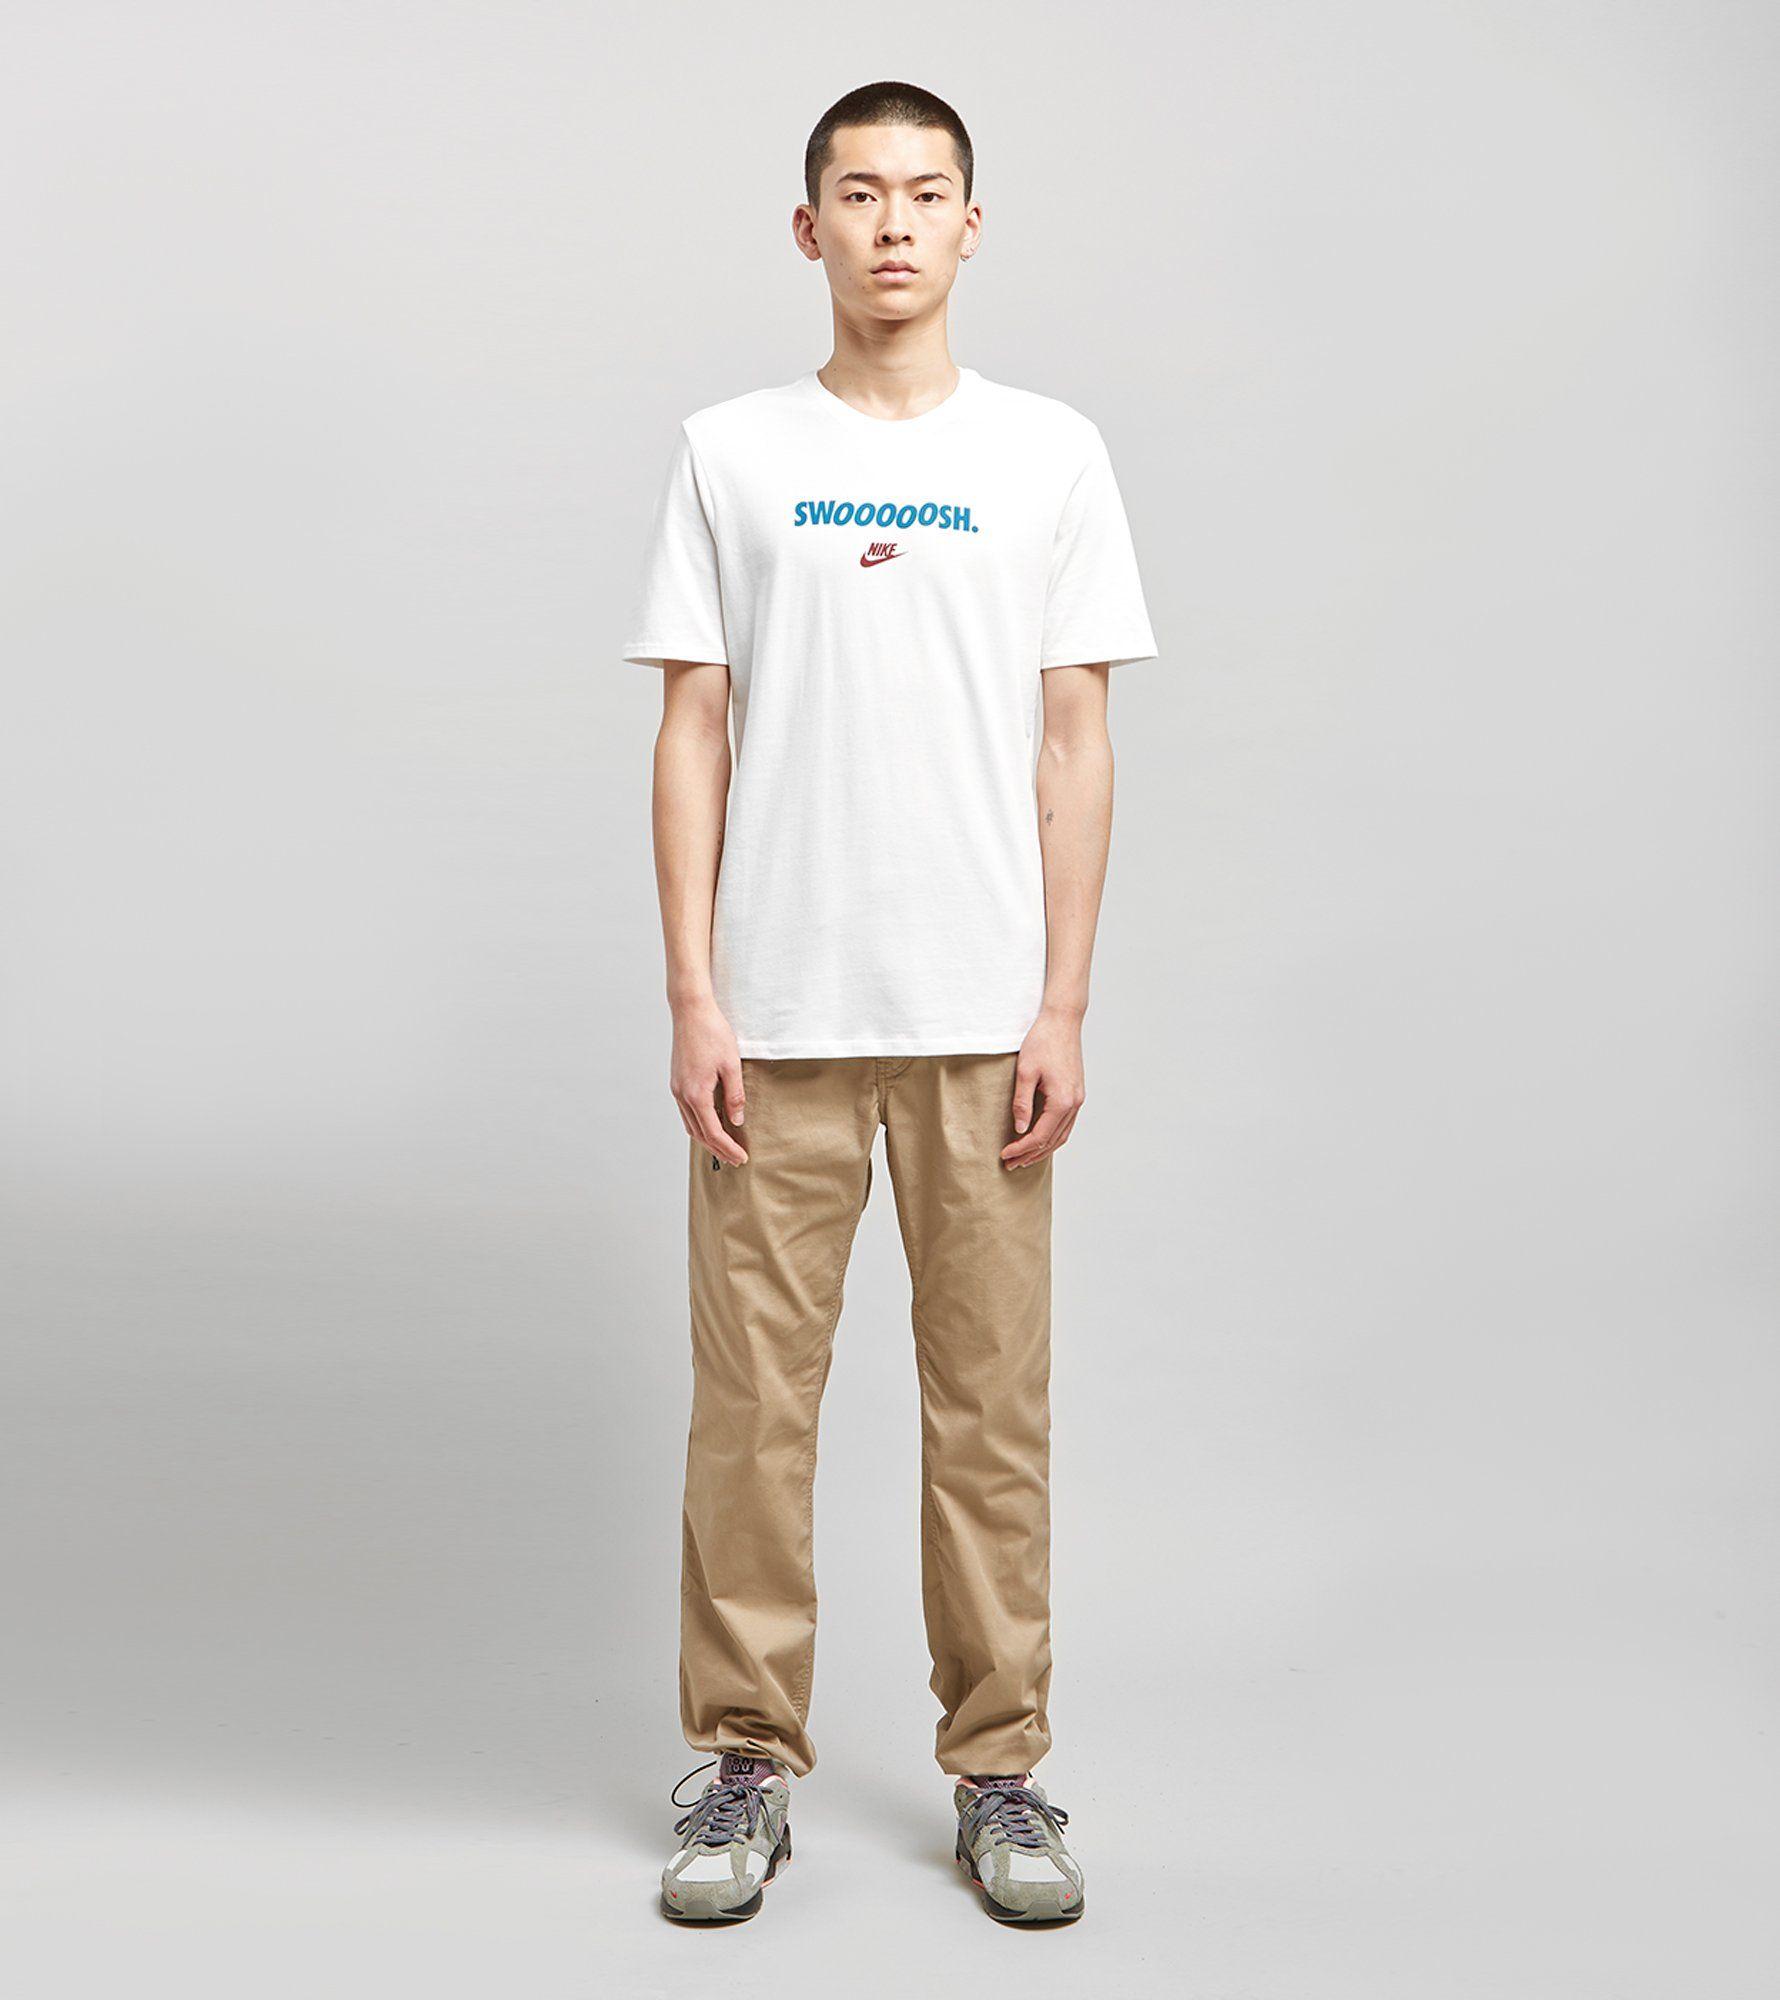 Nike T-Shirt Swooooosh